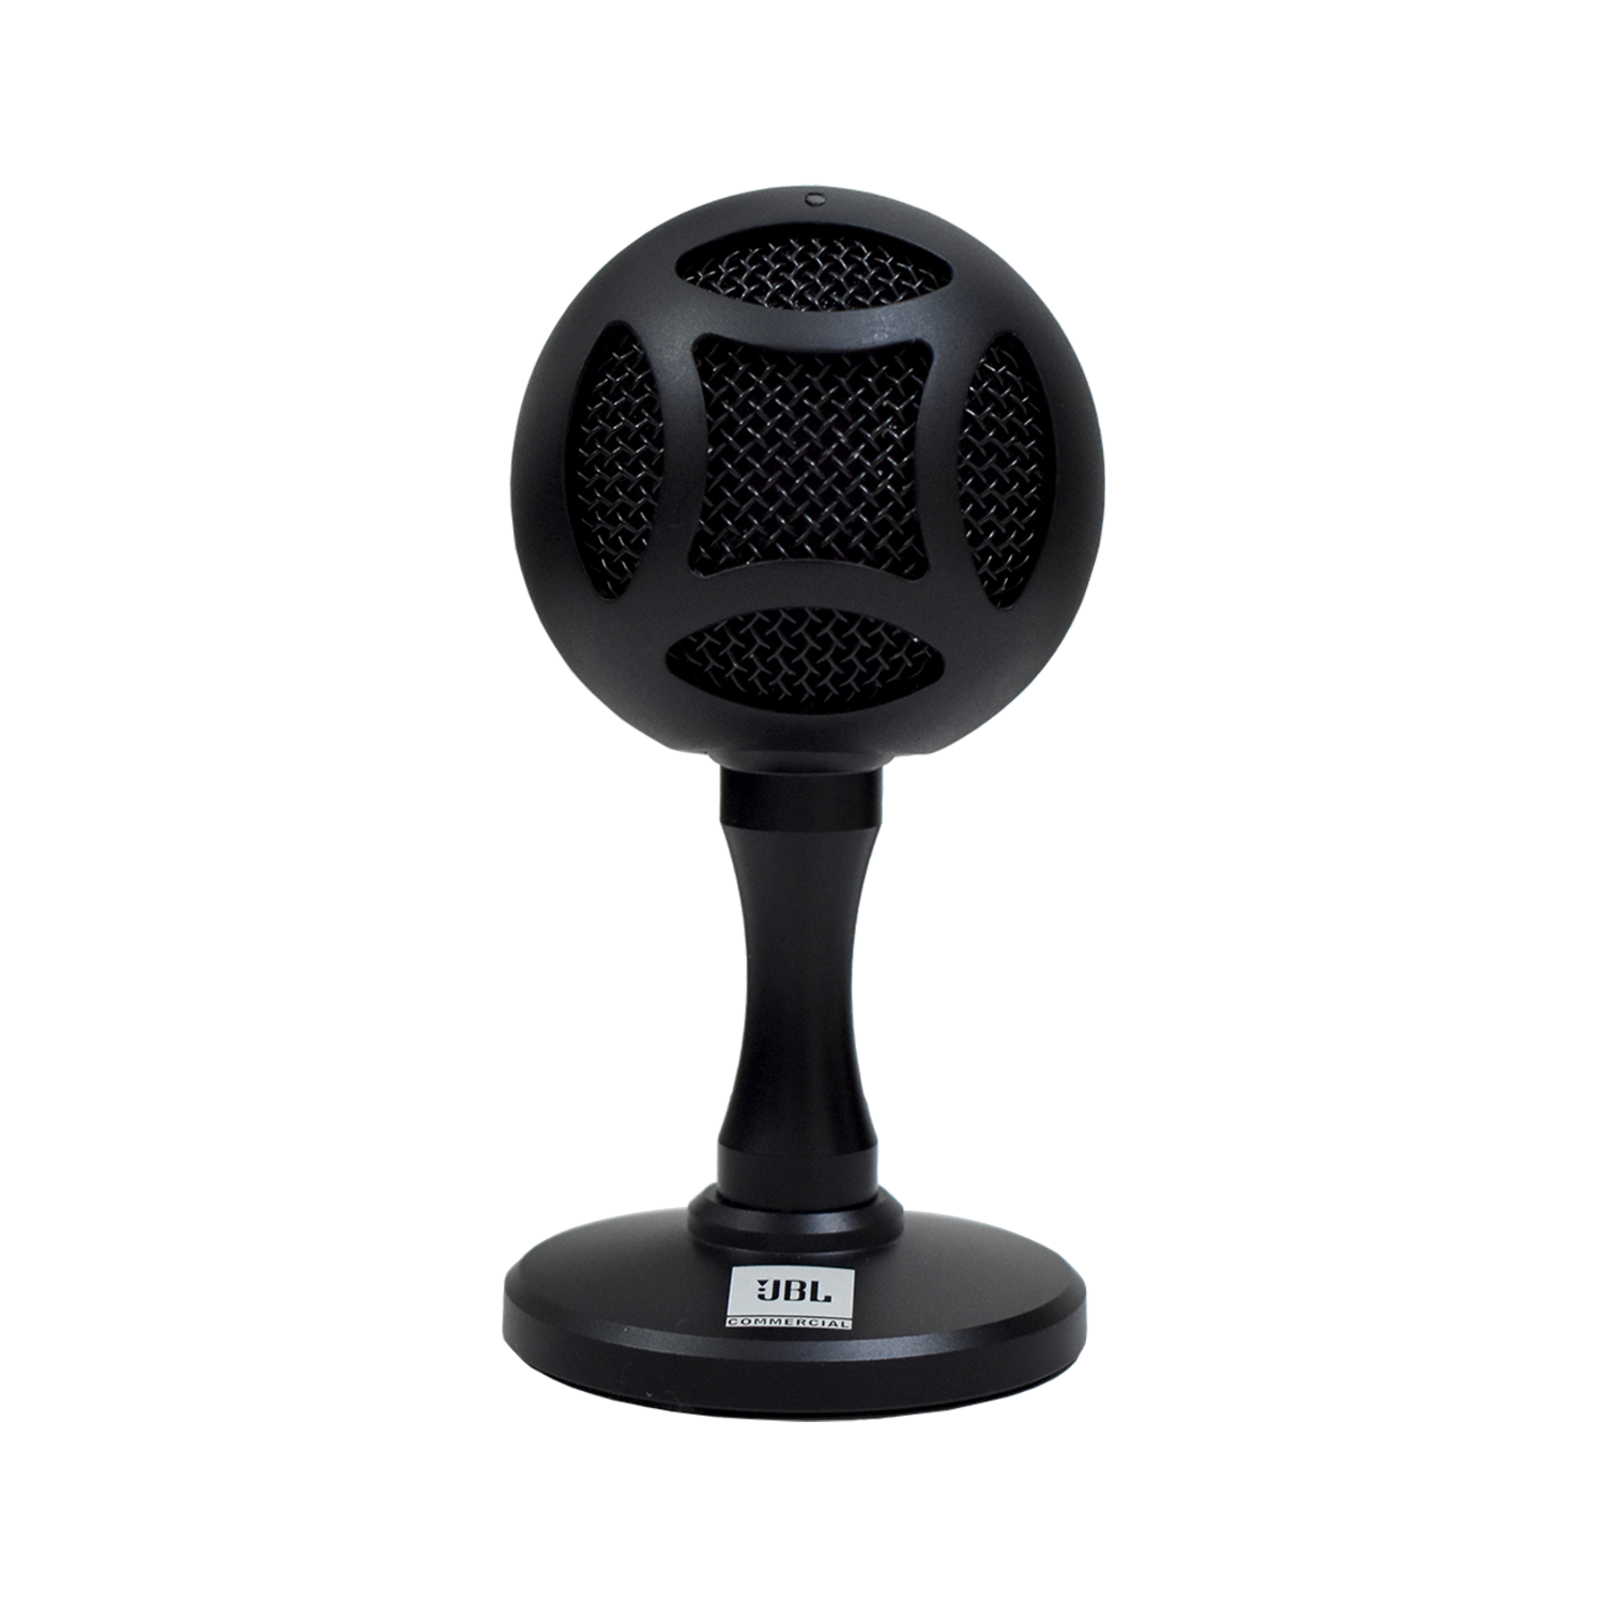 CSUM06 - Black - Mini USB Microphone - Hero